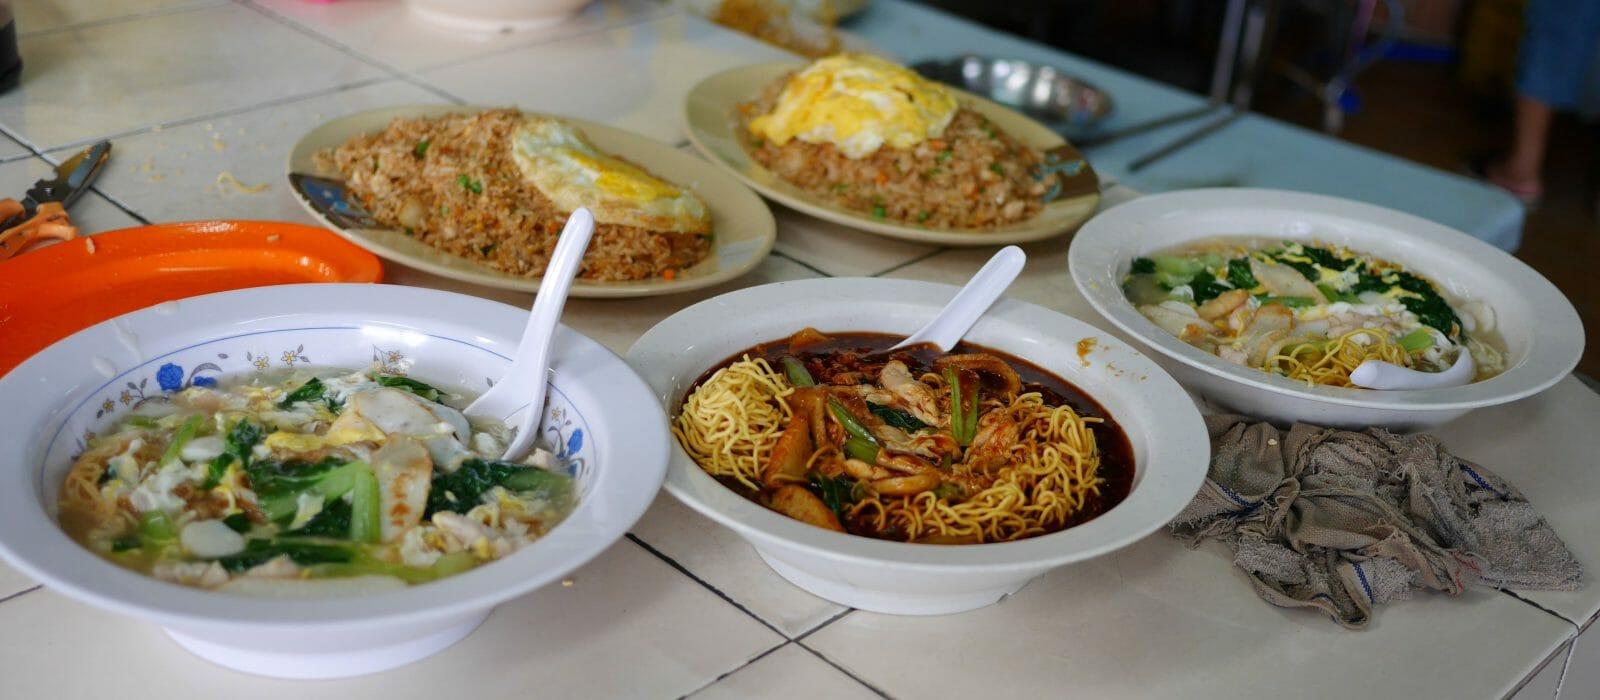 'Sai Chow' at SS15 Wet Market